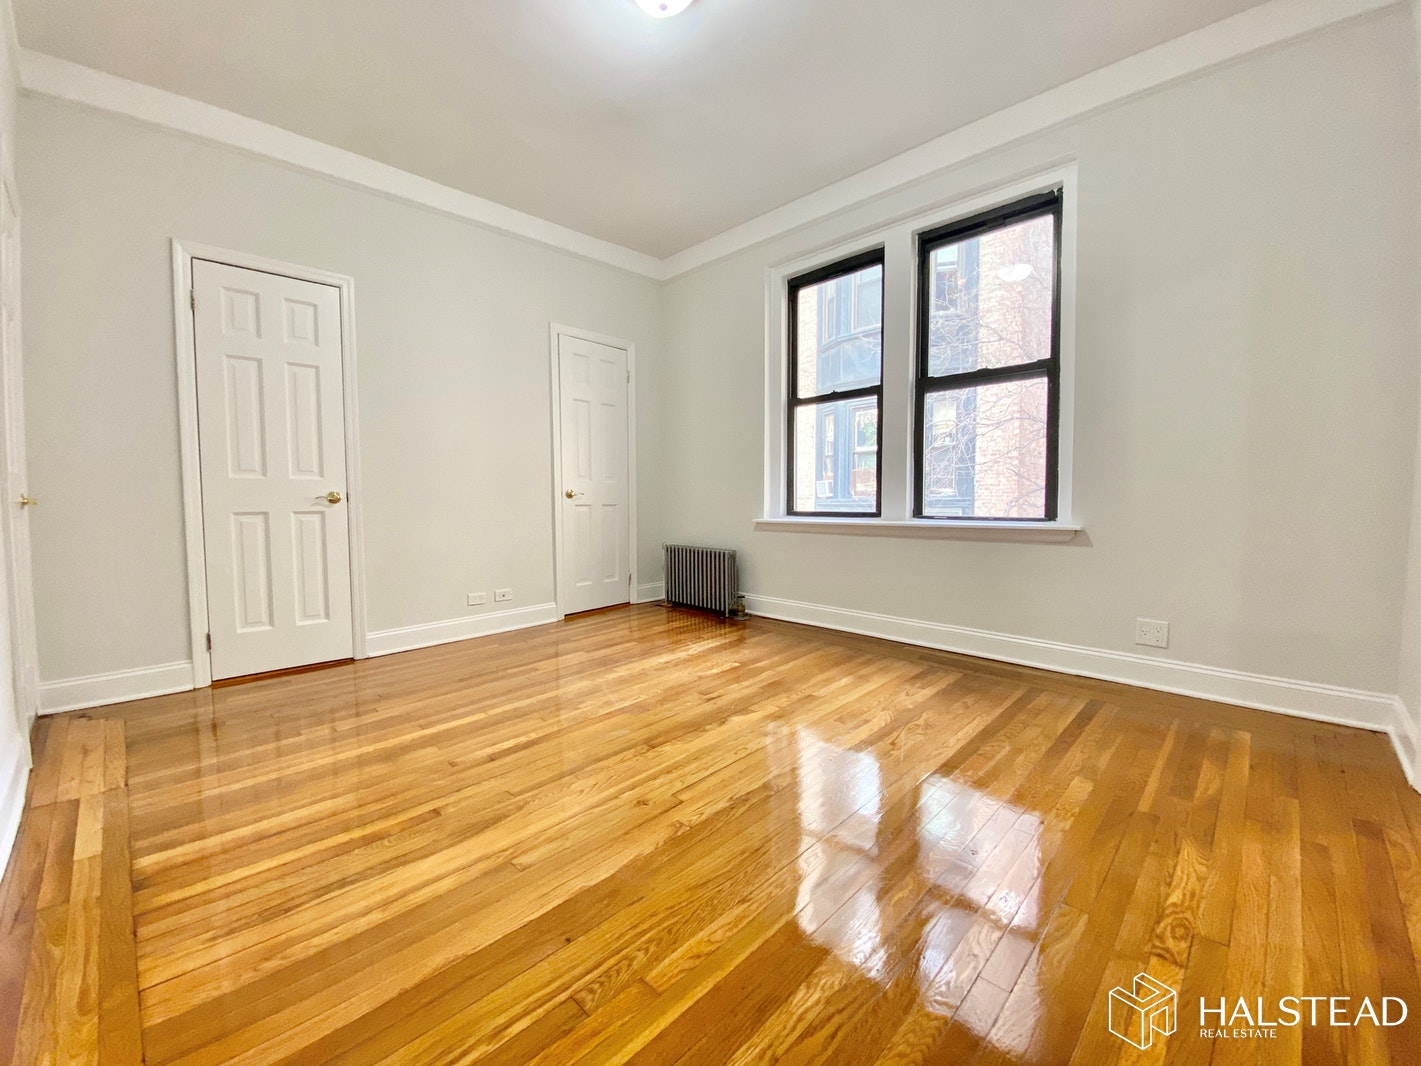 245 WEST 75TH STREET 6F, Upper West Side, $3,100, Web #: 19999239